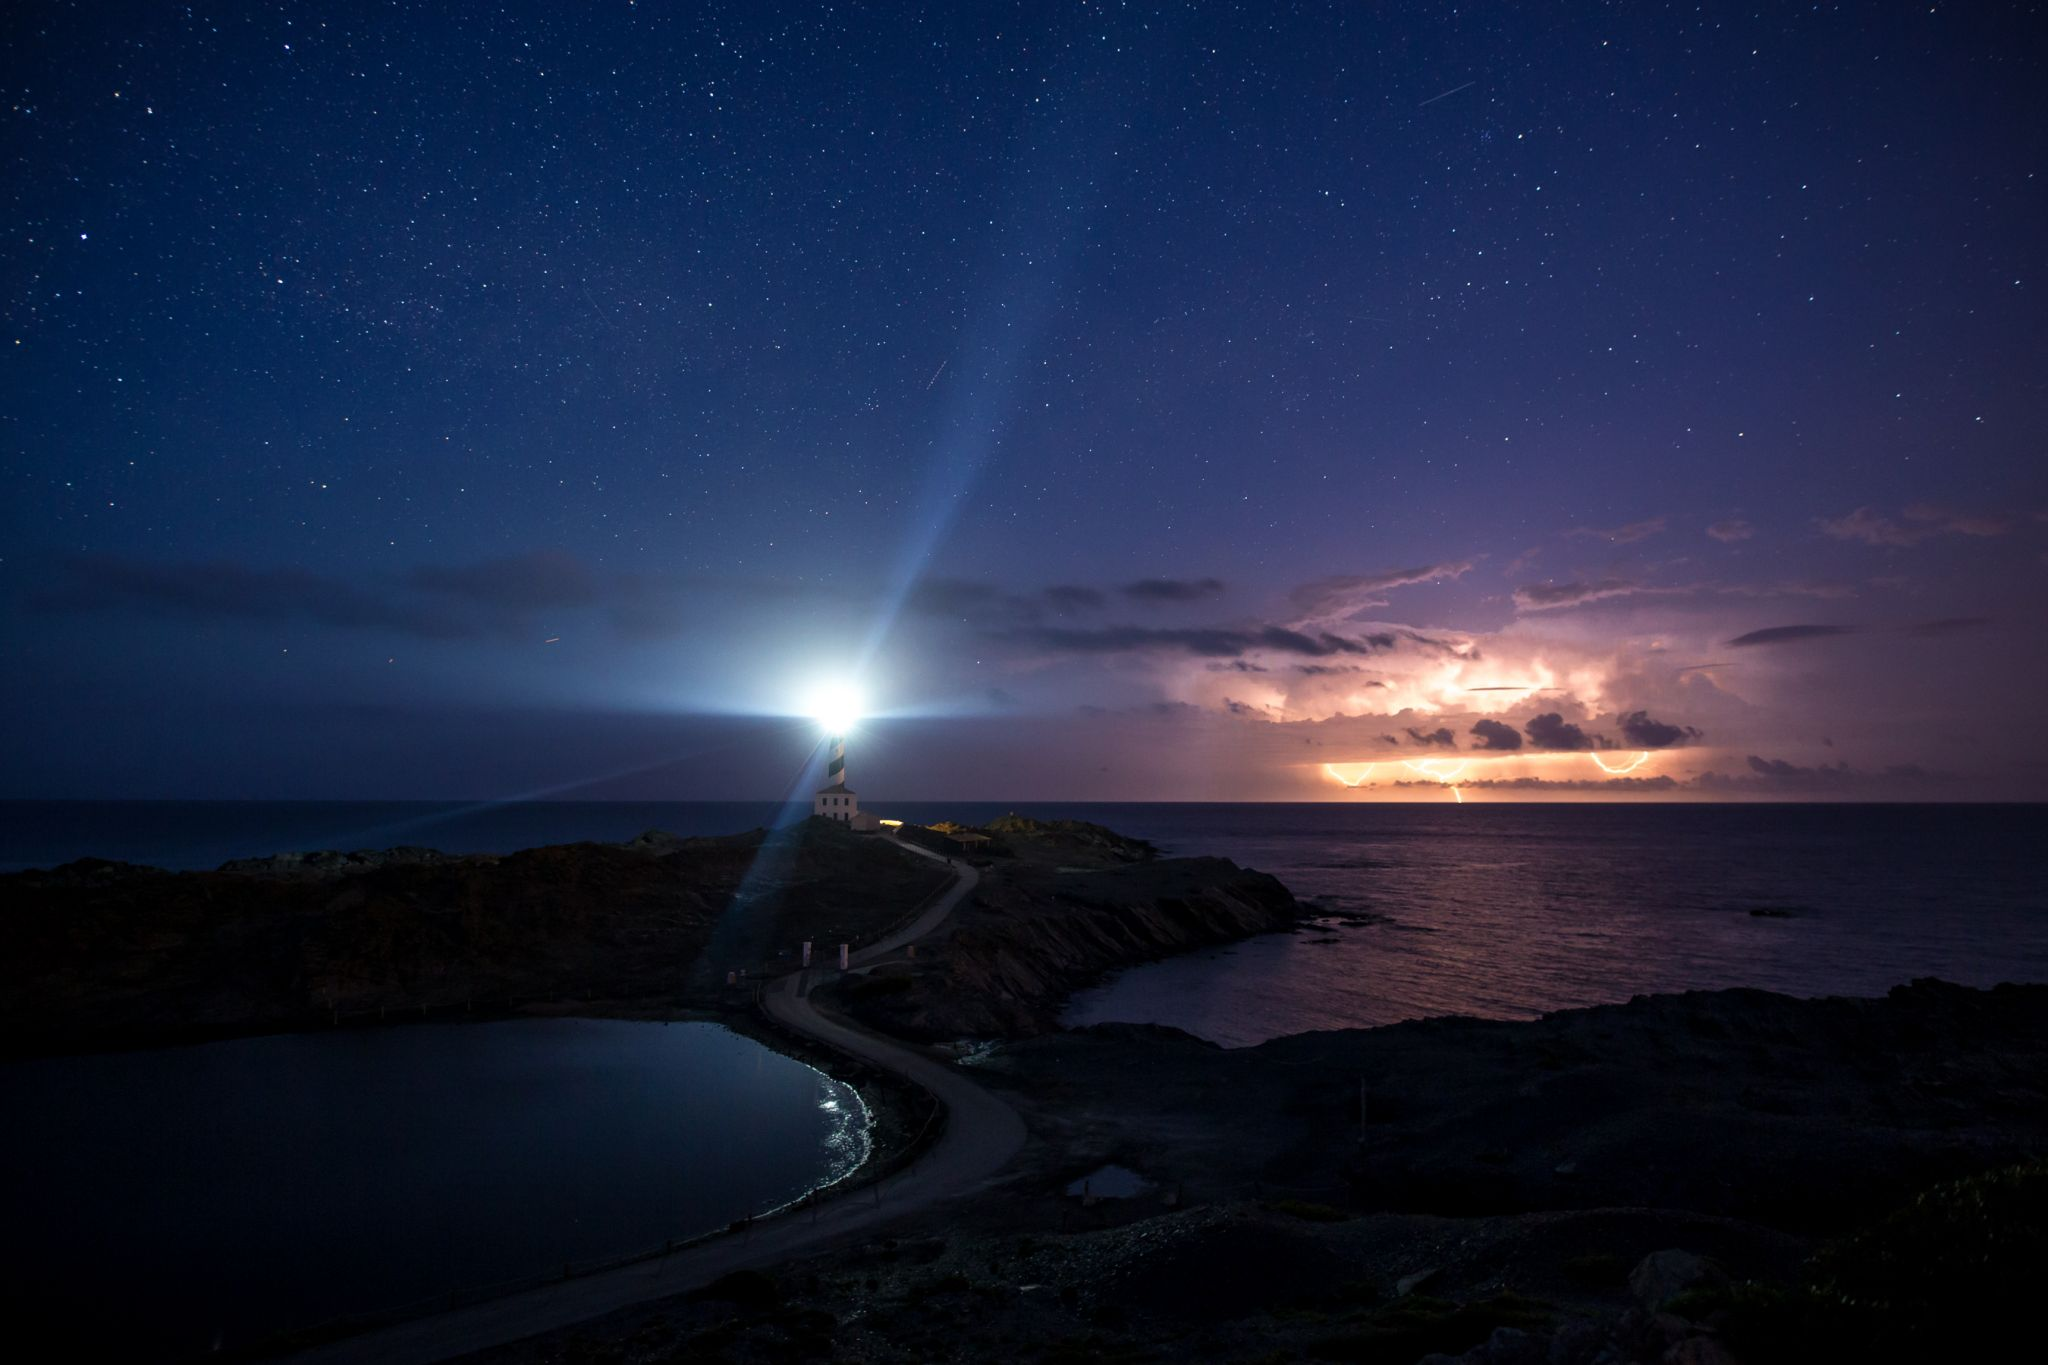 Faro de Favaritx Lighthouse, Spain